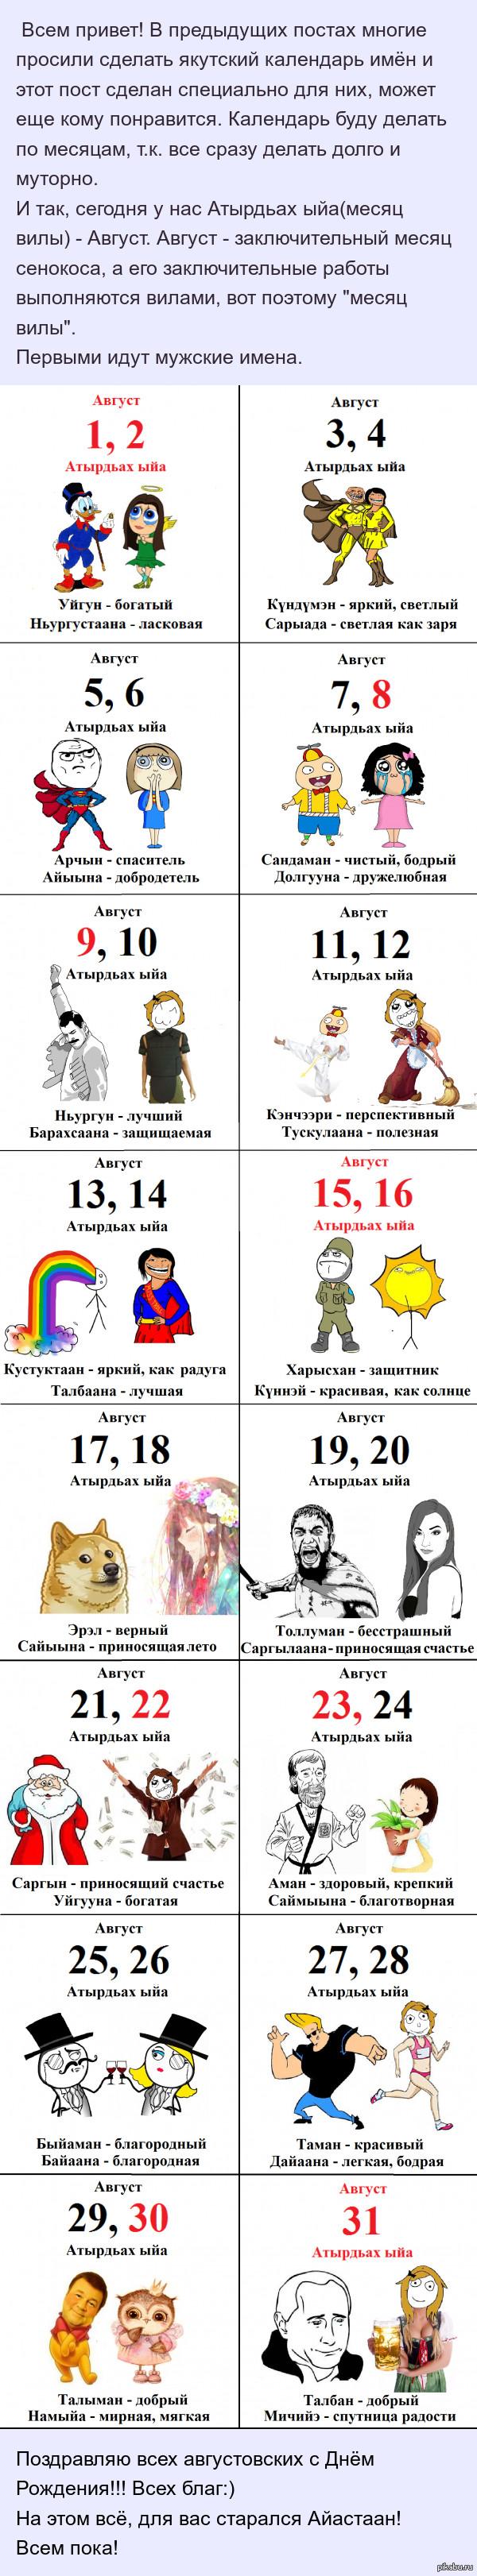 Якутский календарь имен. Август Имена по дате и их значения